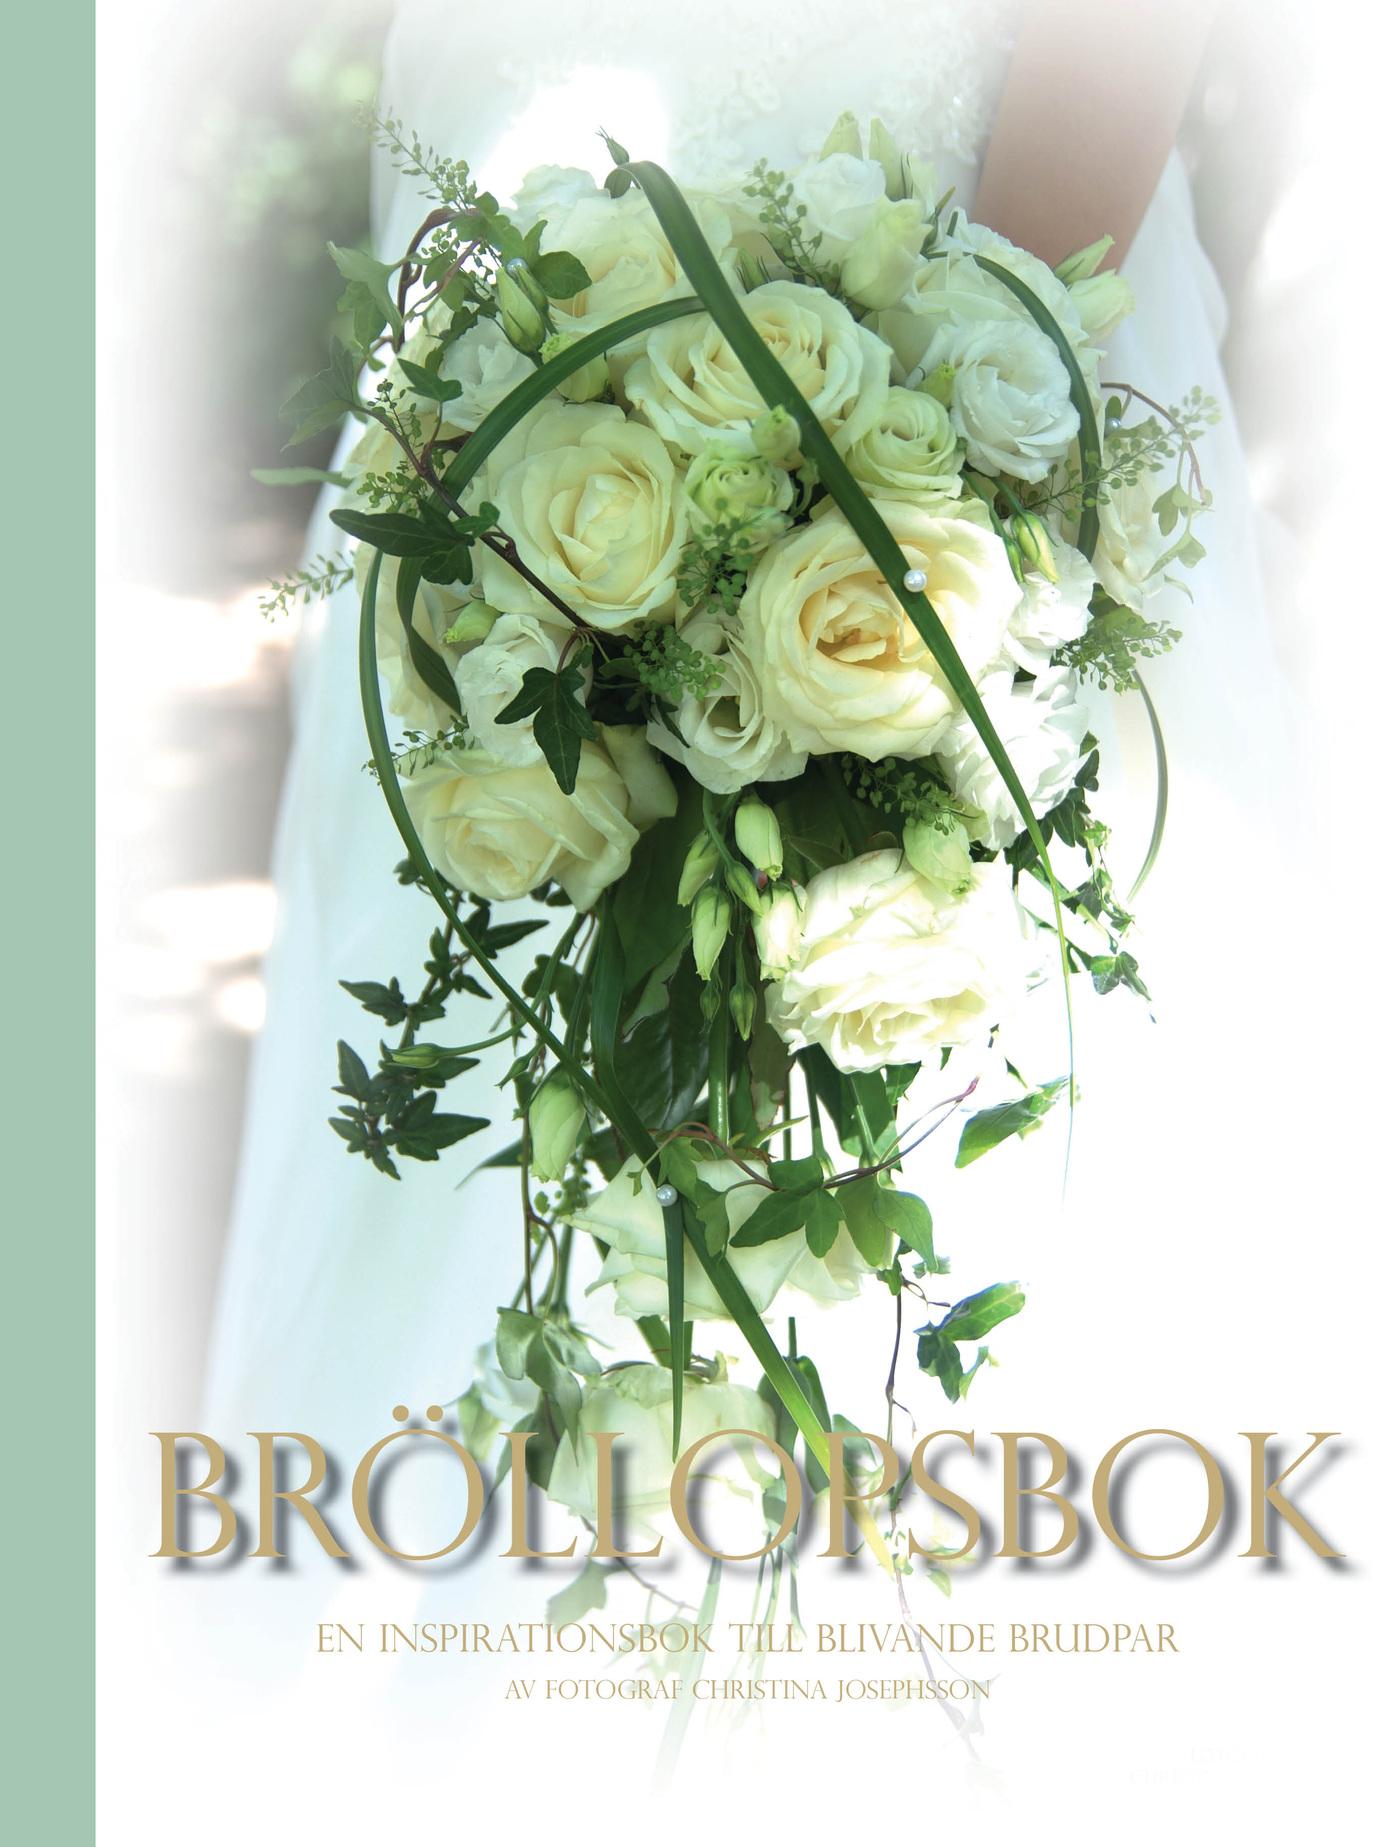 FOTOGRAF Christina Josephsson - Bröllopsbok - en inspirationsbok till blivande brudpar